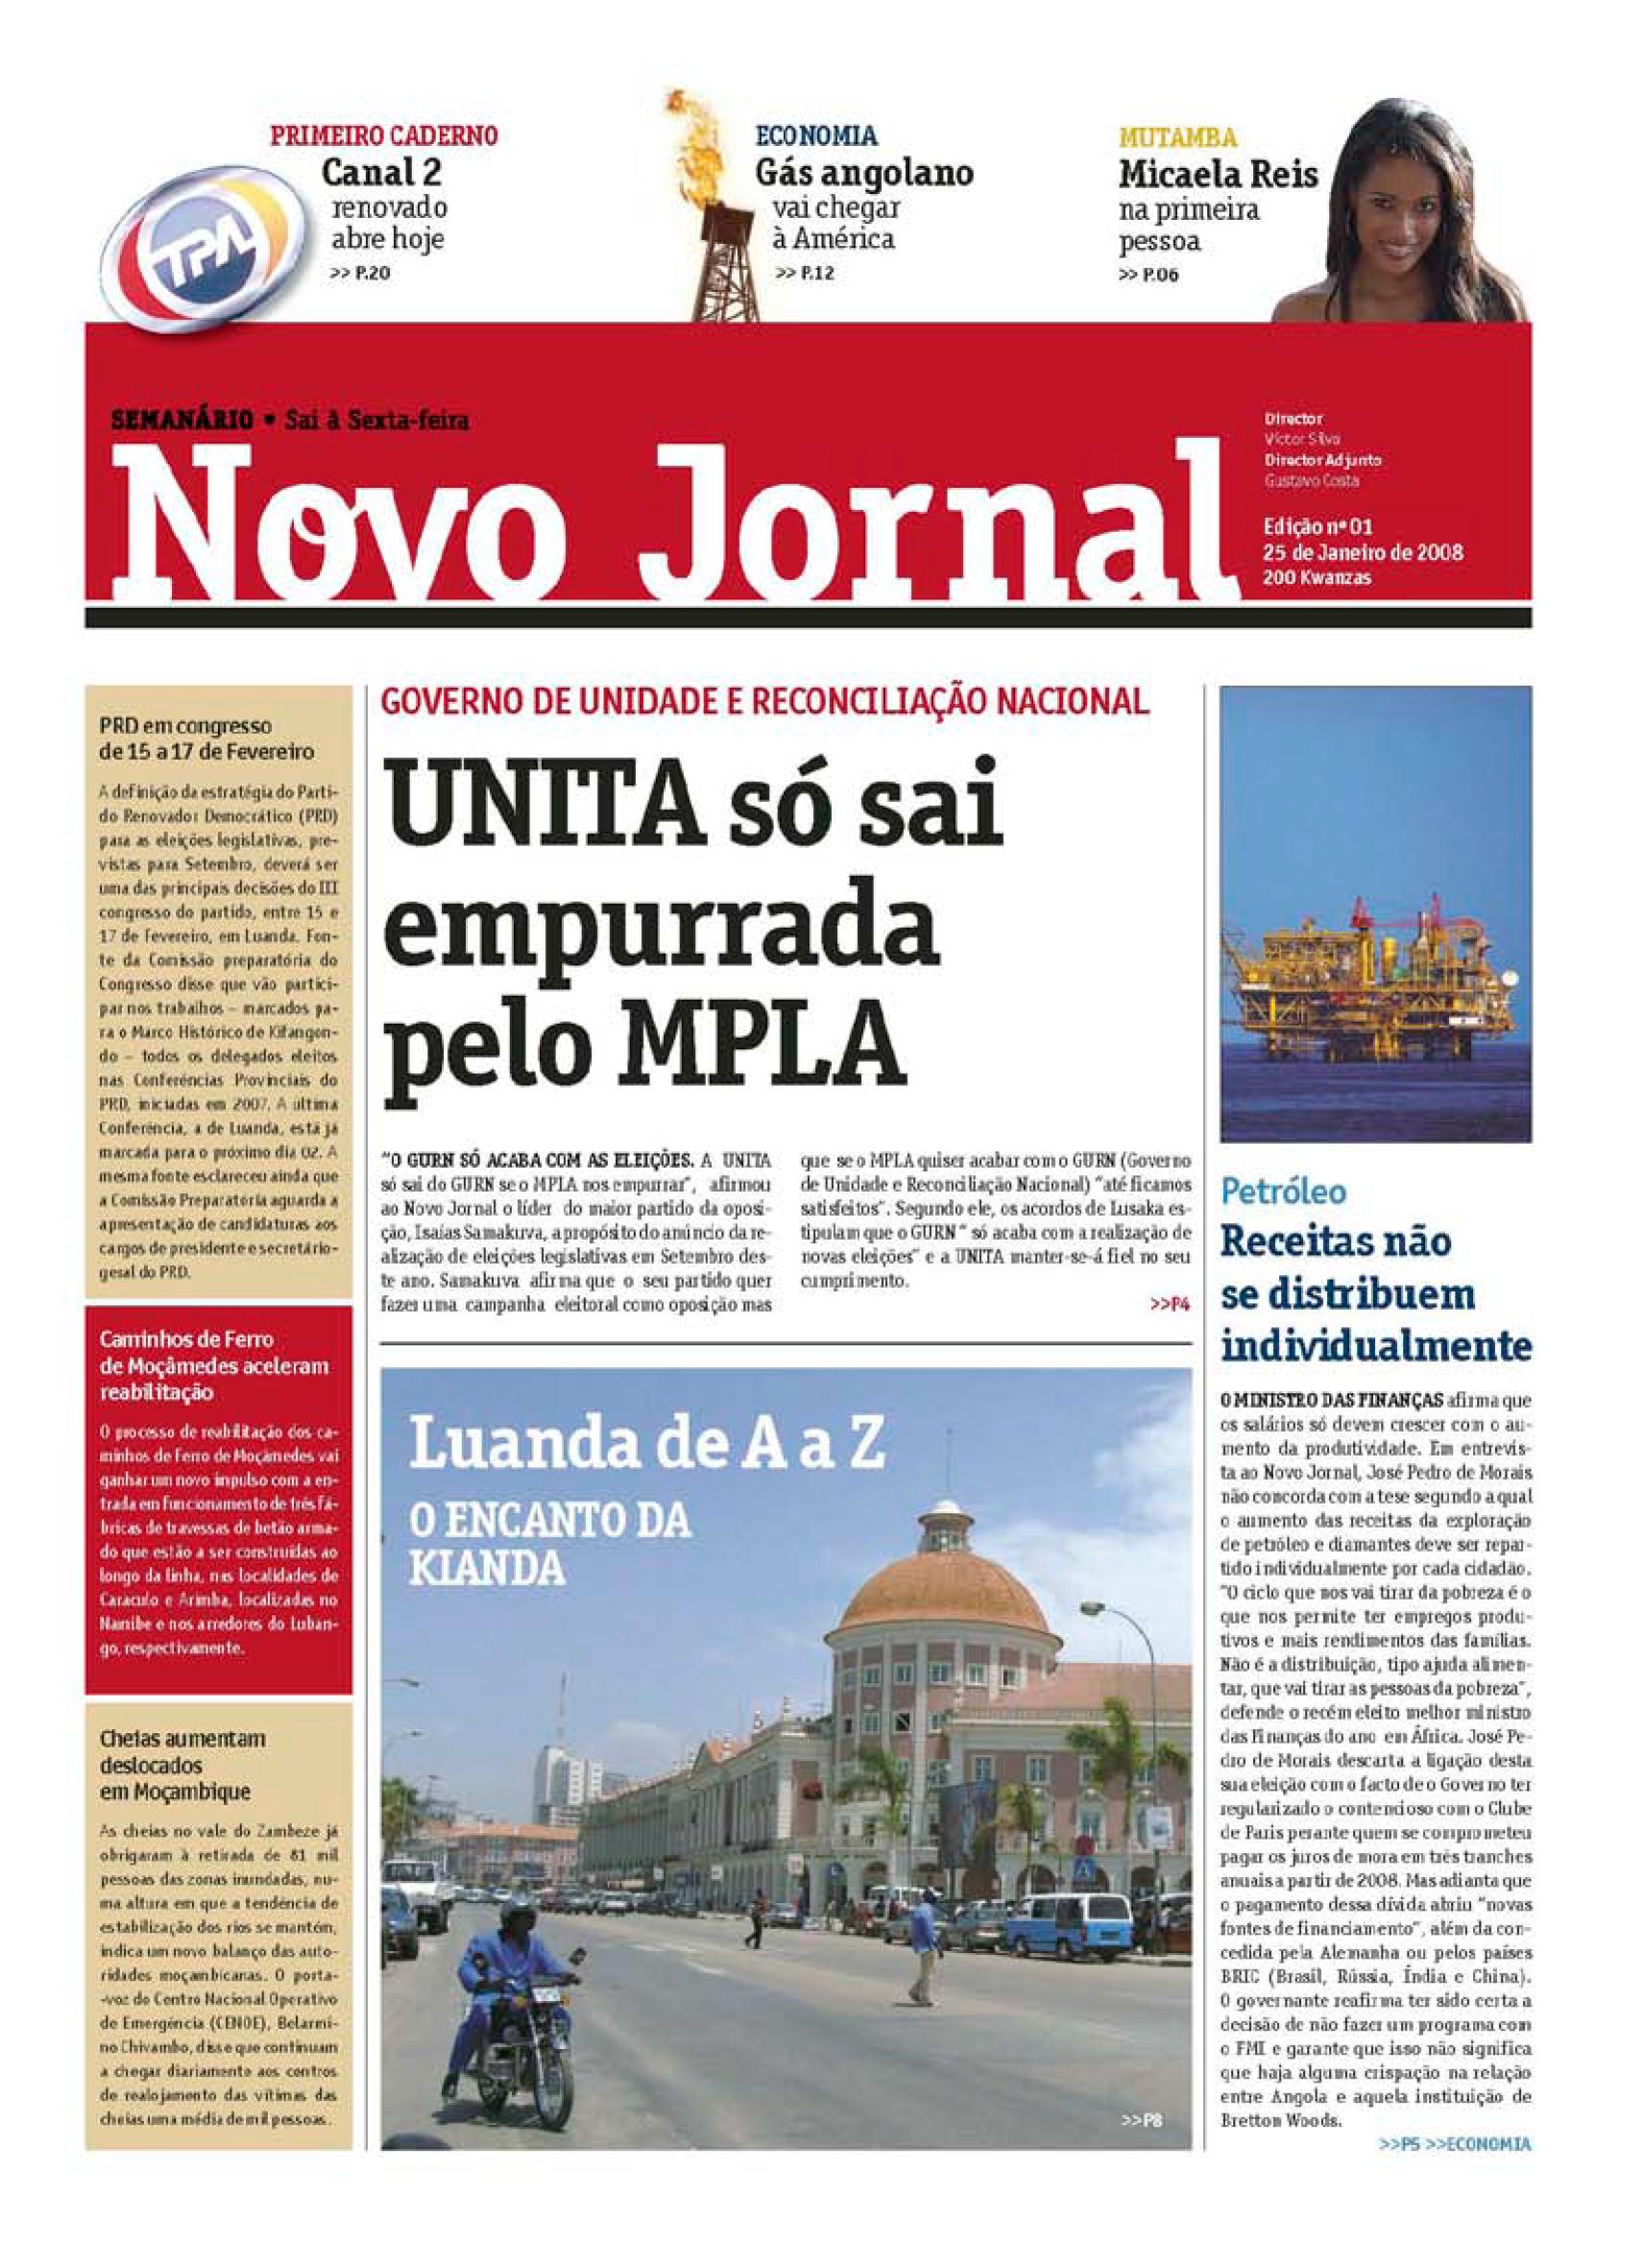 Capa do Novo Jornal n.º 1